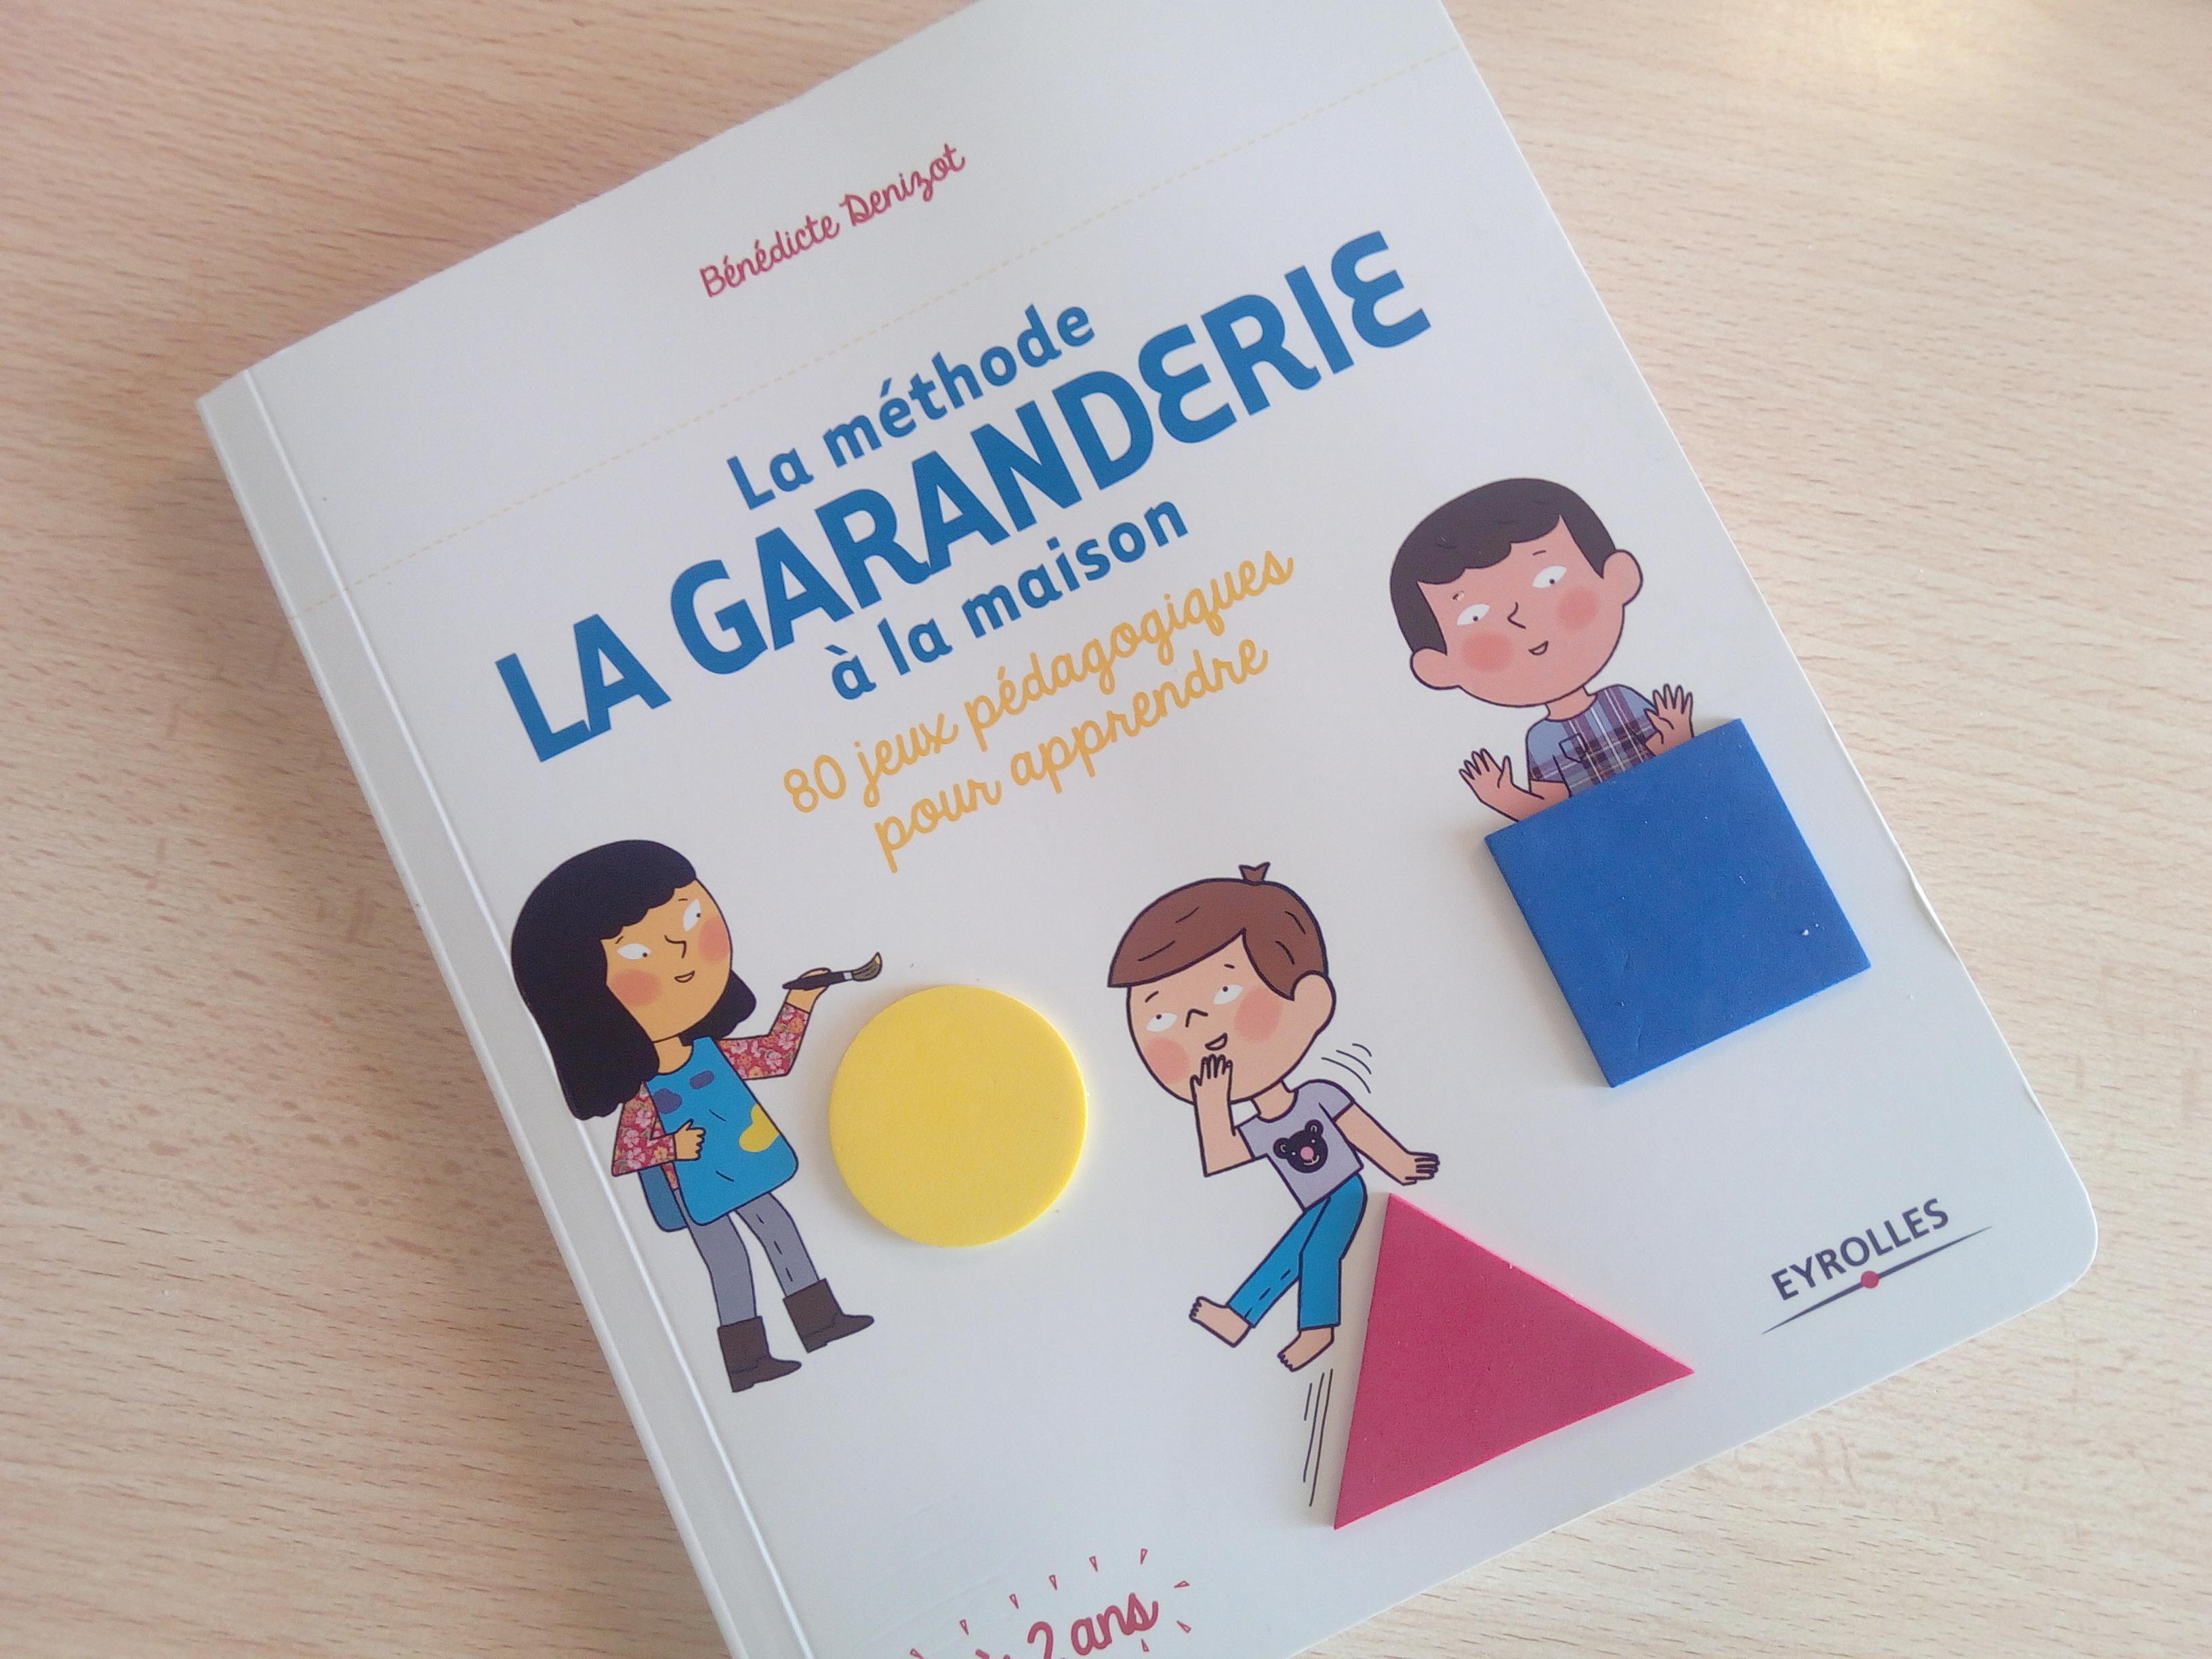 apprendre pédagogie garanderie